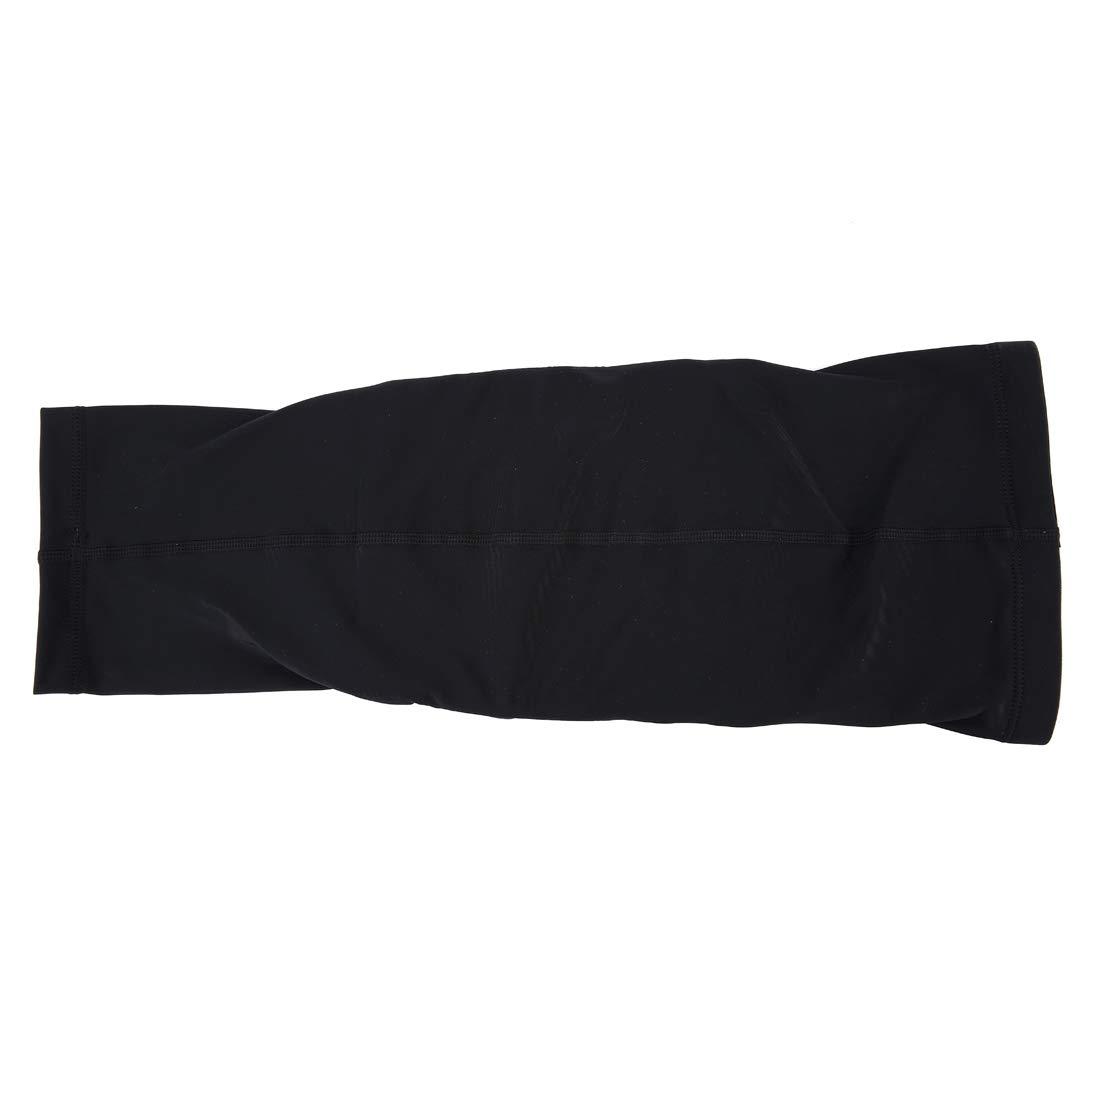 Anstorematealliance Sports&Entertainment Sports&Entertainment Factory 1 PC Beehive Shaped Sports Collision-Resistant Lycra Elastic Knee Support Guard, Long Version, Size: M(Black) (Color : Black) by Anstorematealliance (Image #2)